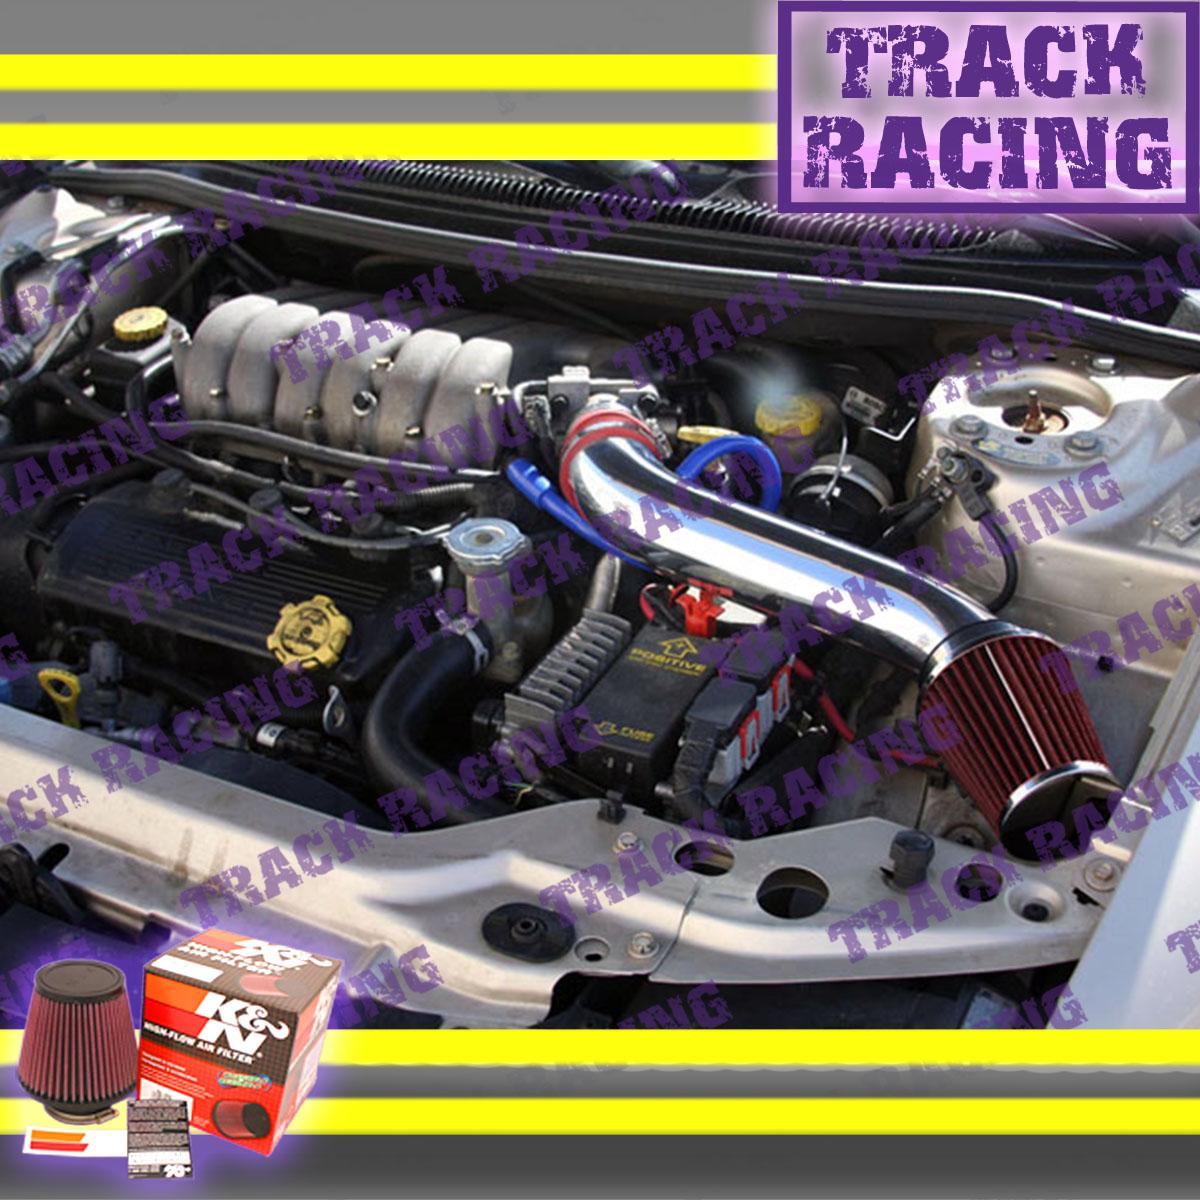 95-00 DODGE STRATUS//CHRYSLER SEBRING//CIRRUS 2.5 2.5L V6 AIR INTAKE KIT LONG NEW